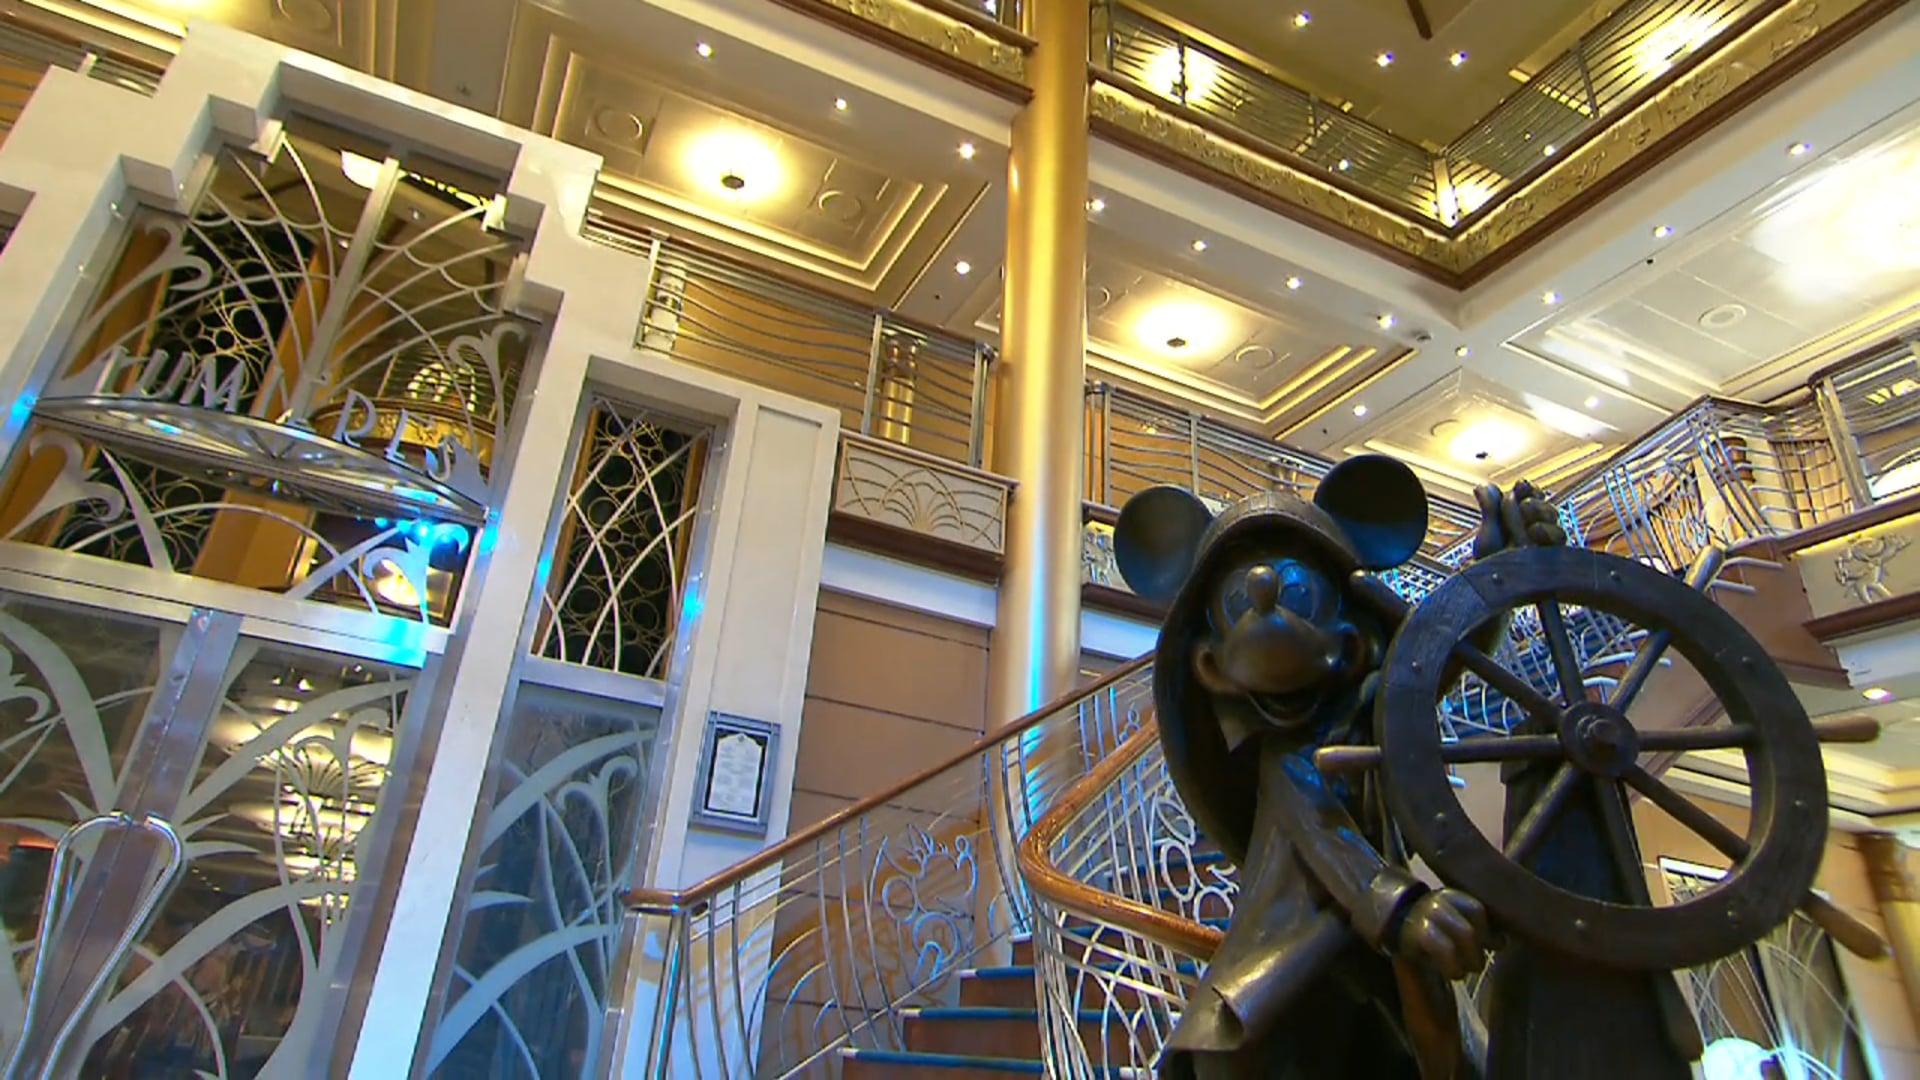 Minnie Mouse on atrium